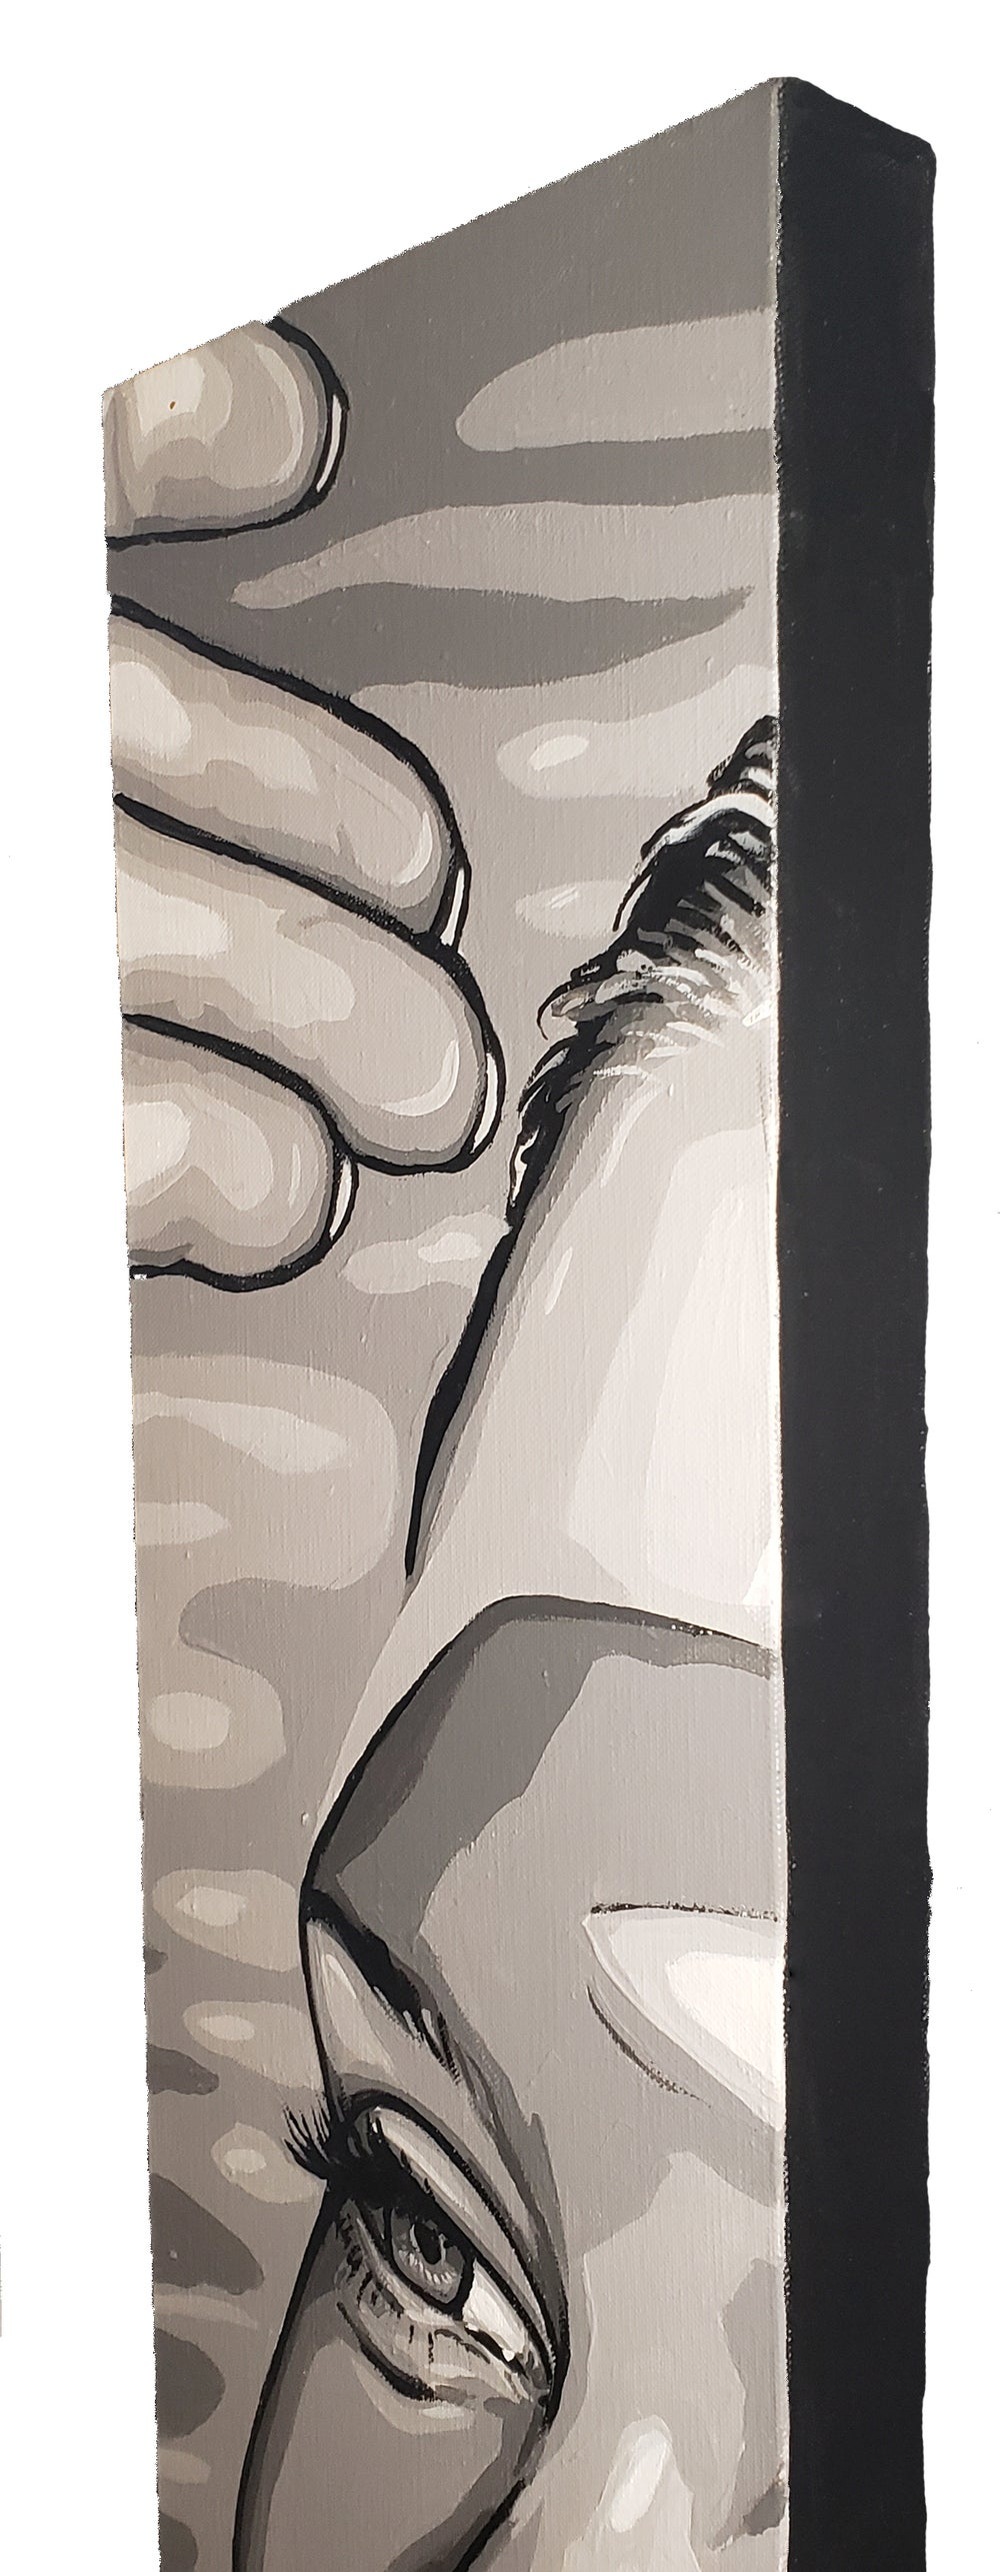 She Soak - Original Painting